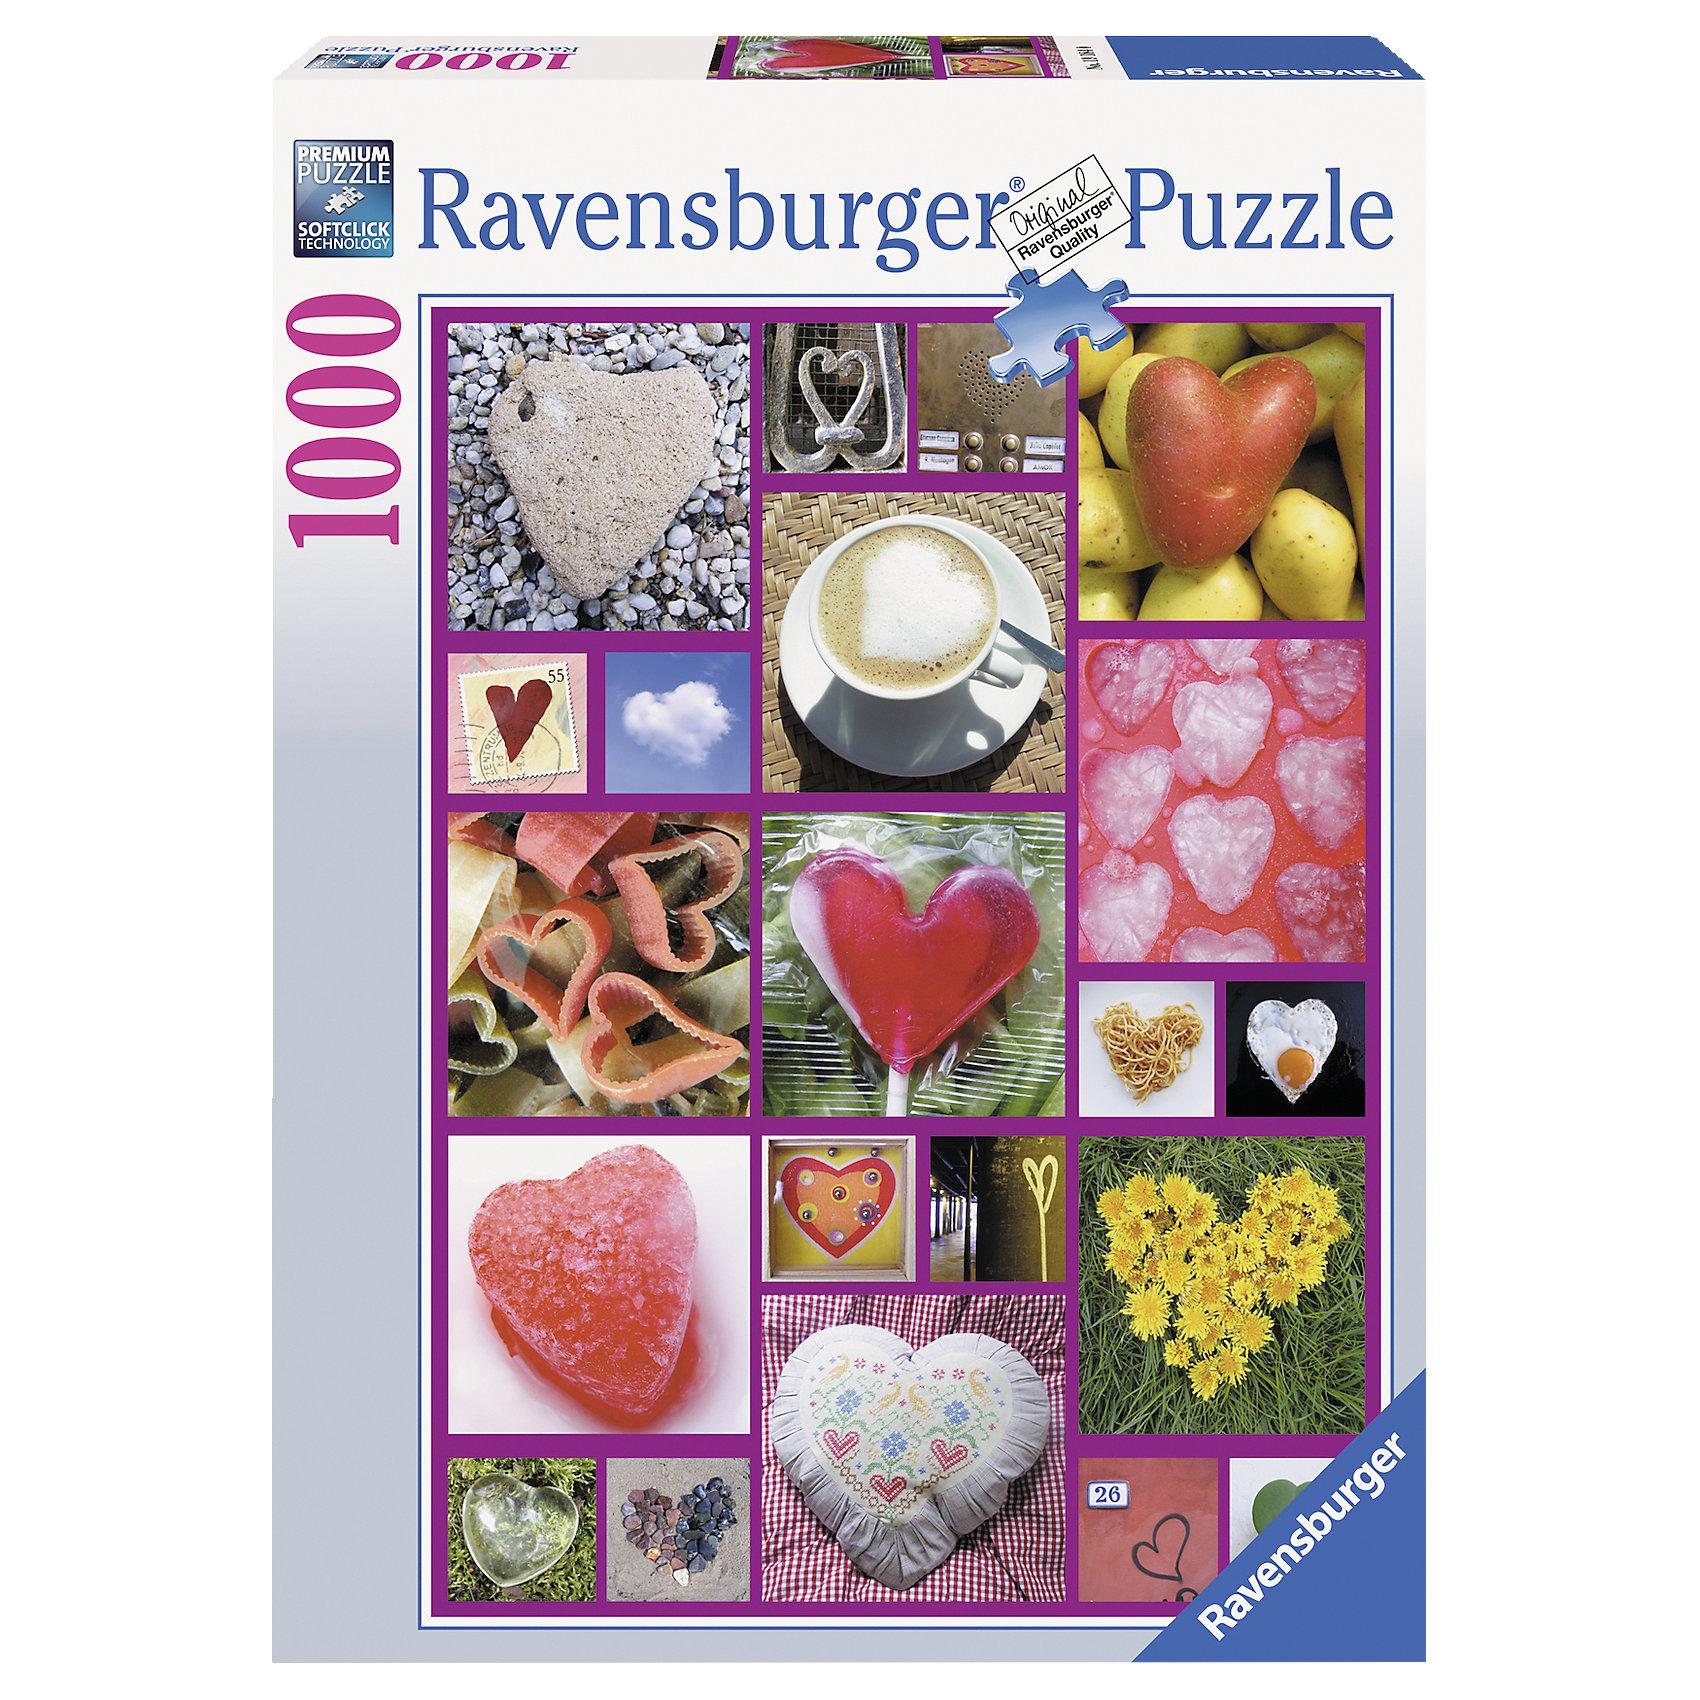 Ravensburger Пазл «Сердца» 1000 деталей, Ravensburger пазл для раскрашивания арт терапия царь зверей origami 360 деталей